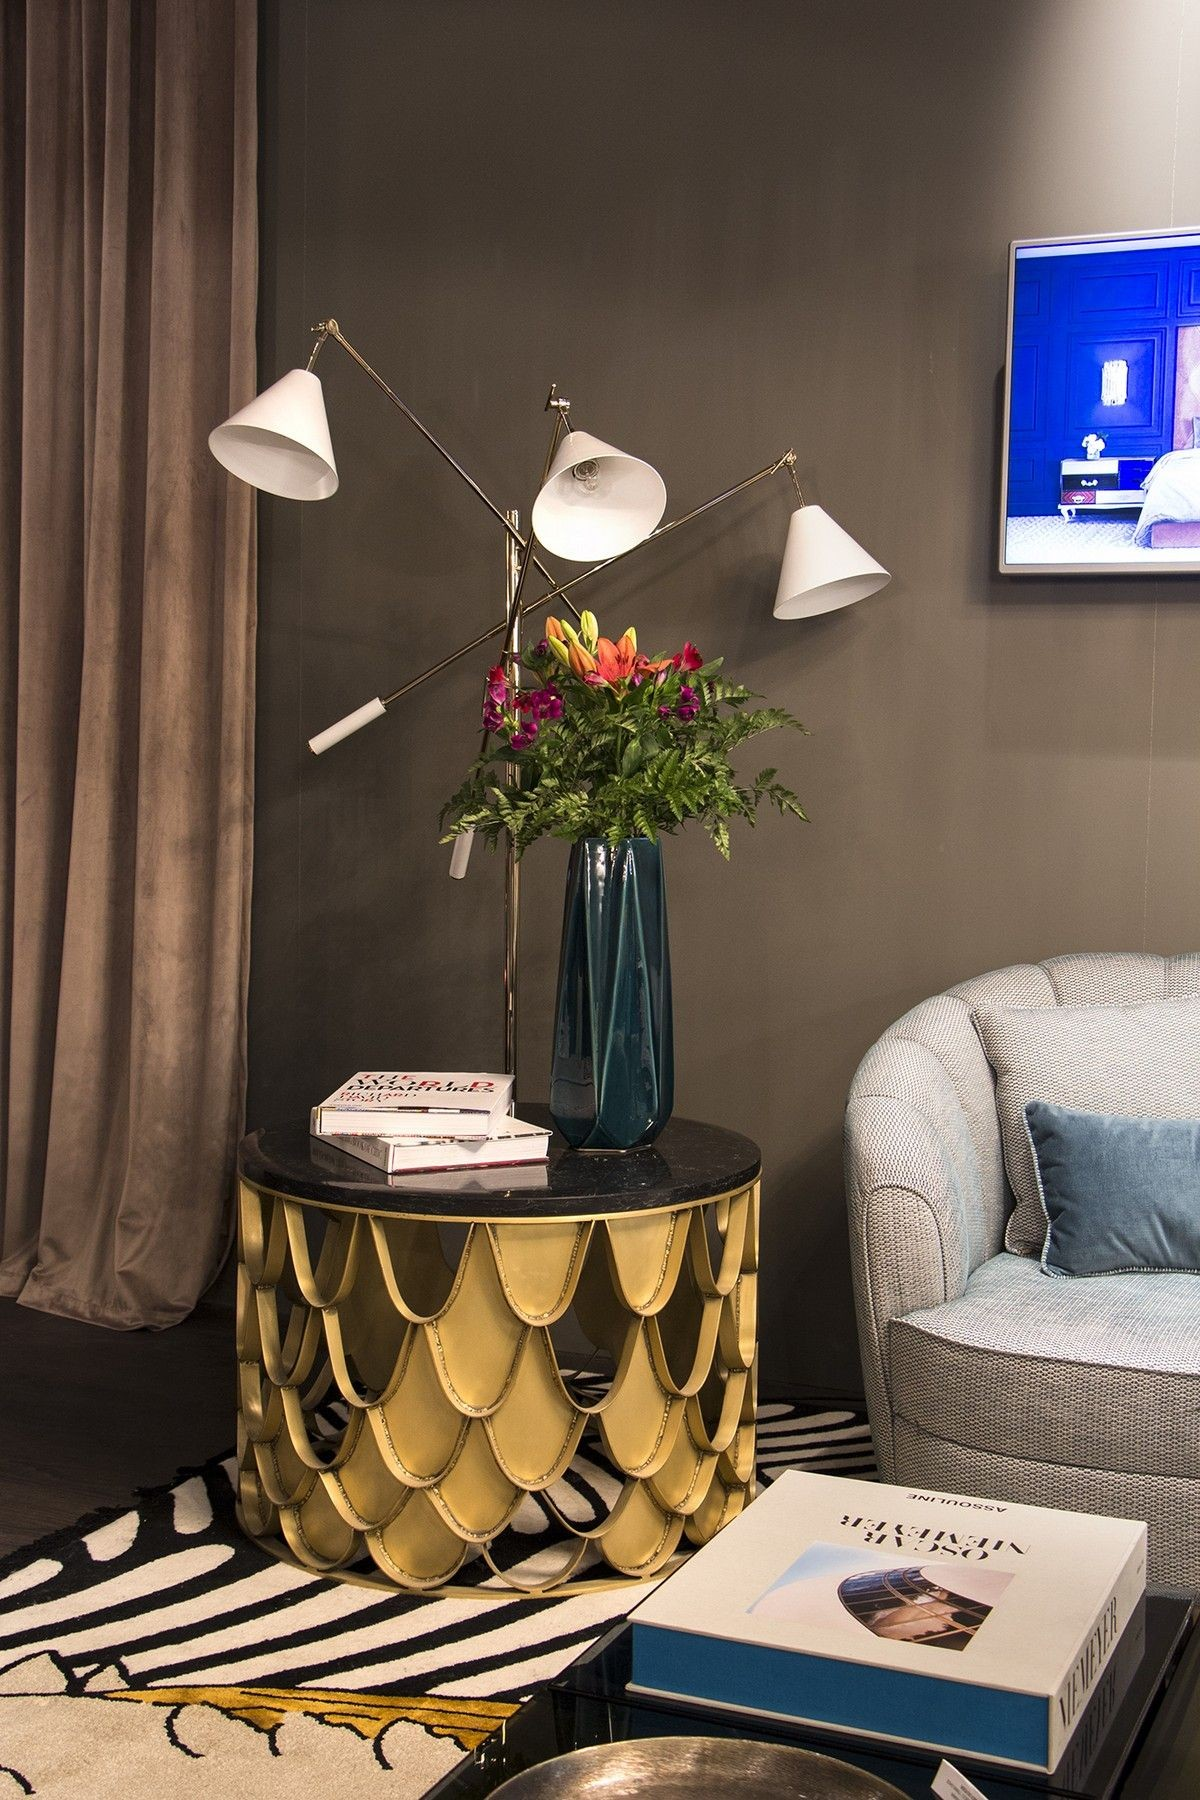 Koi Center Table – Craftsmanship Meets Modern Design koi center table Koi Center Table – Craftsmanship Meets Modern Design 010e4c0559b848dd239e7fd40073f36b